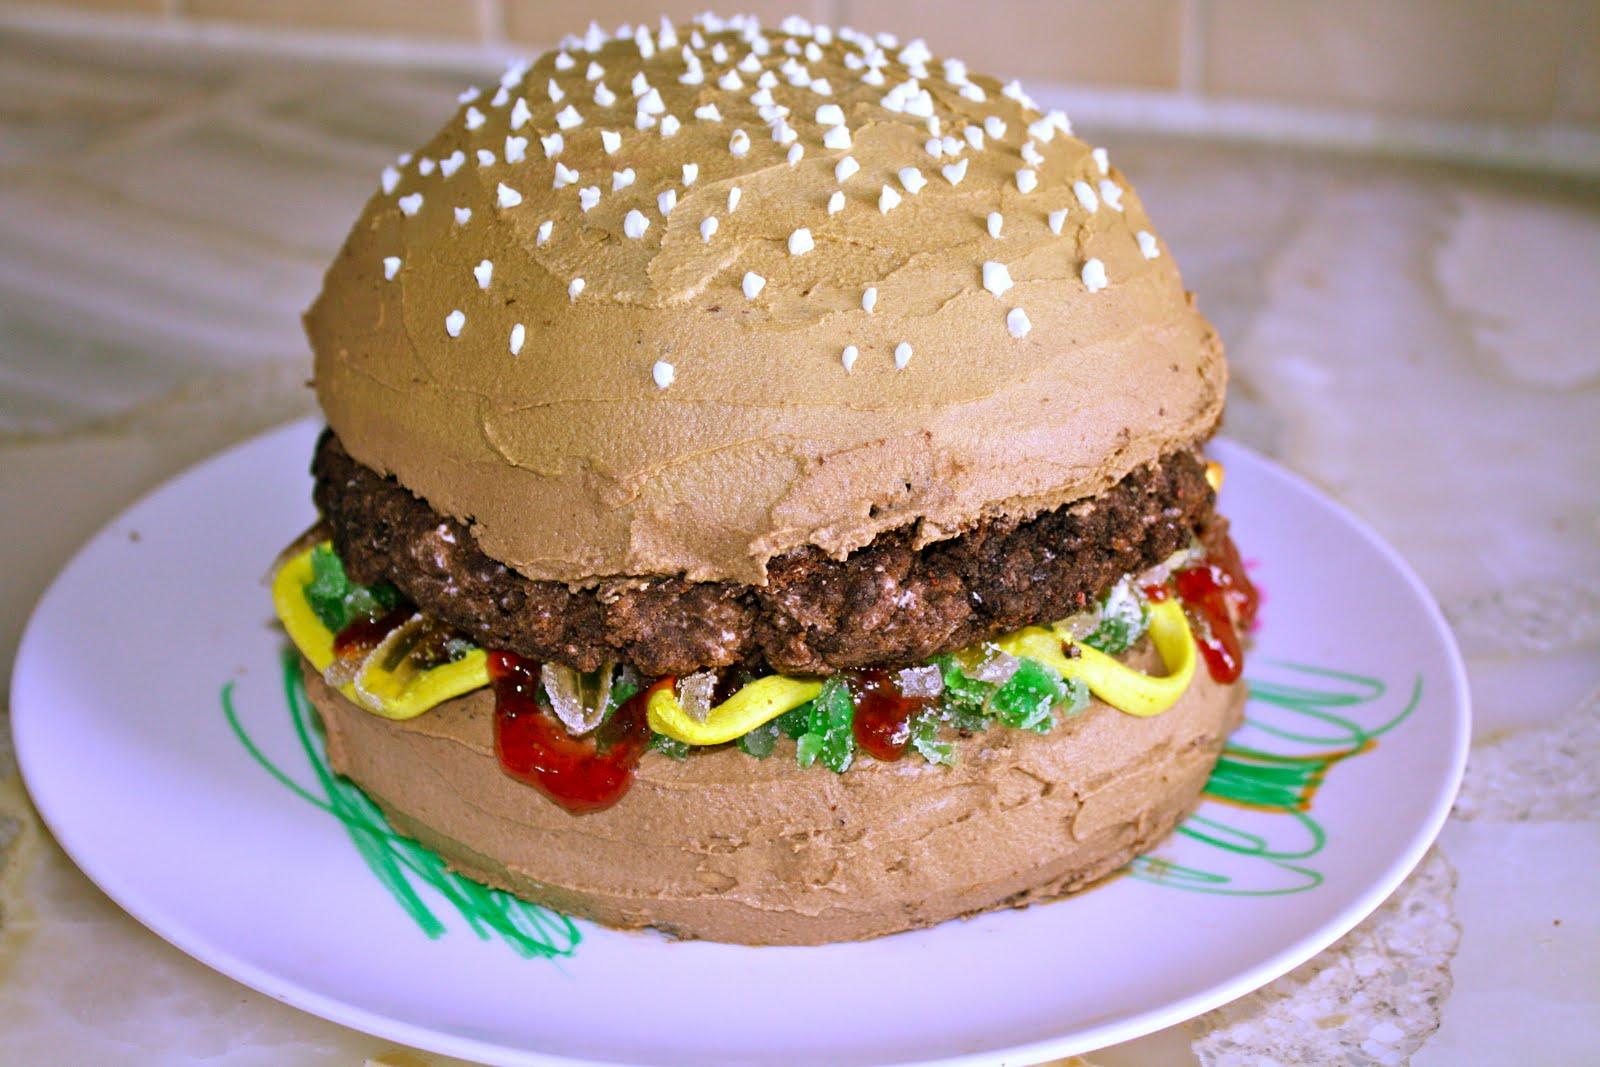 Cool Hamburger Cakes Decoration Ideas Little Birthday Cakes Funny Birthday Cards Online Inifodamsfinfo